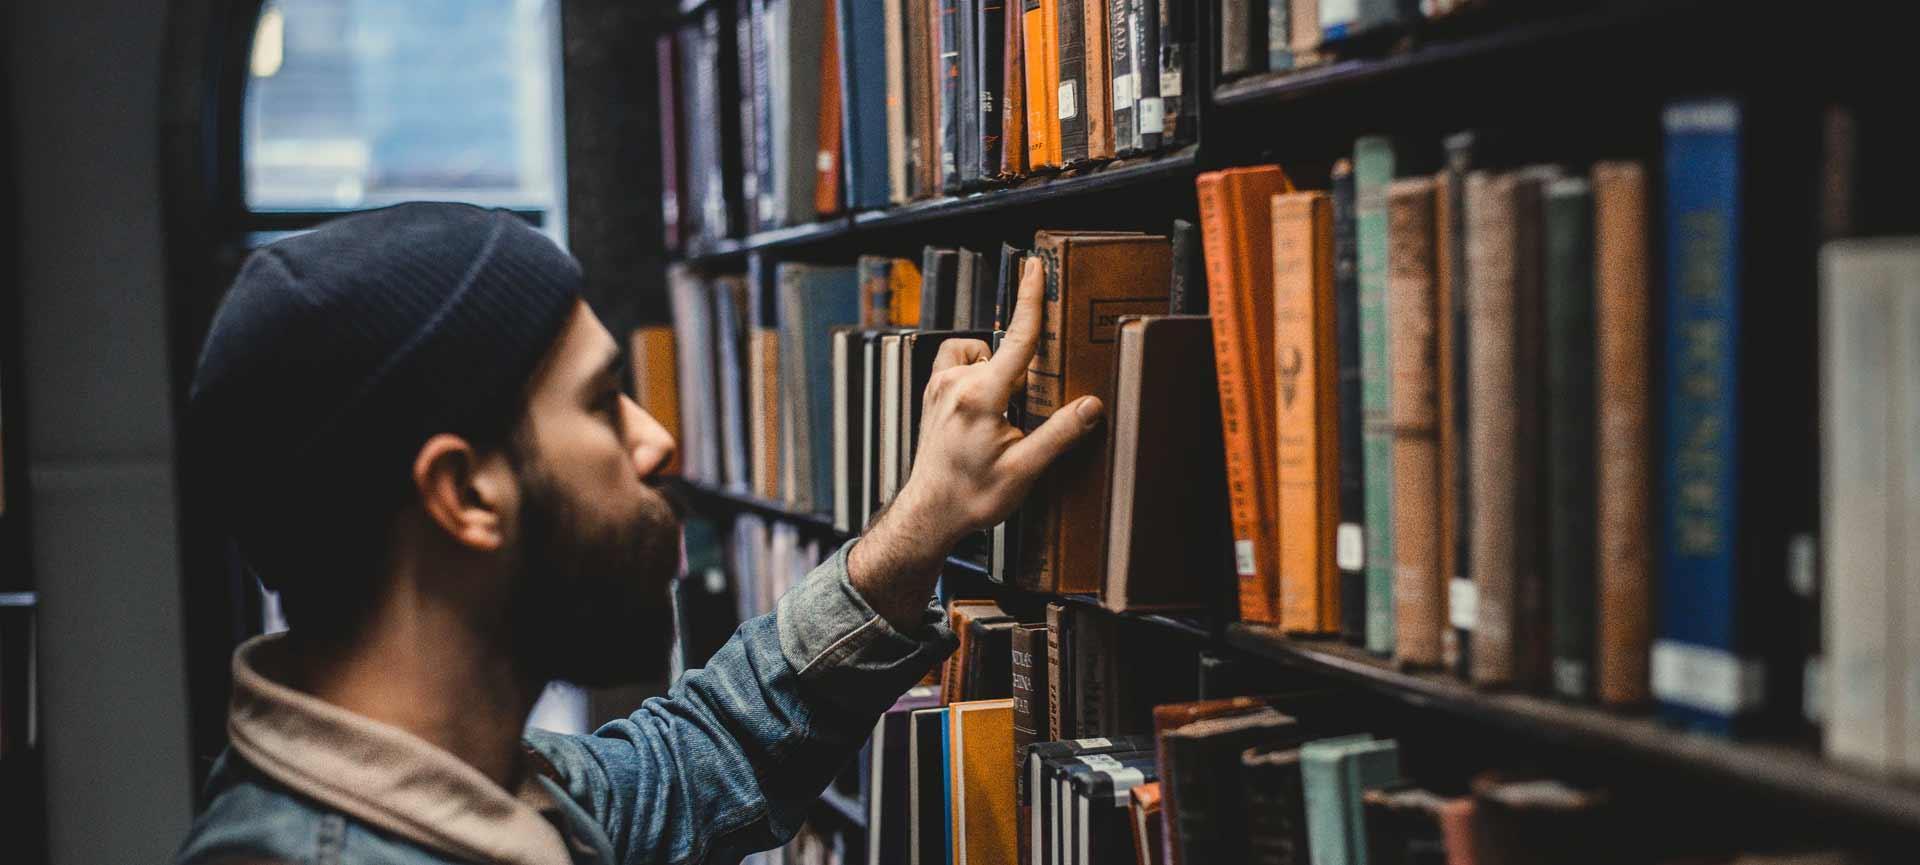 Man selecting book at the library